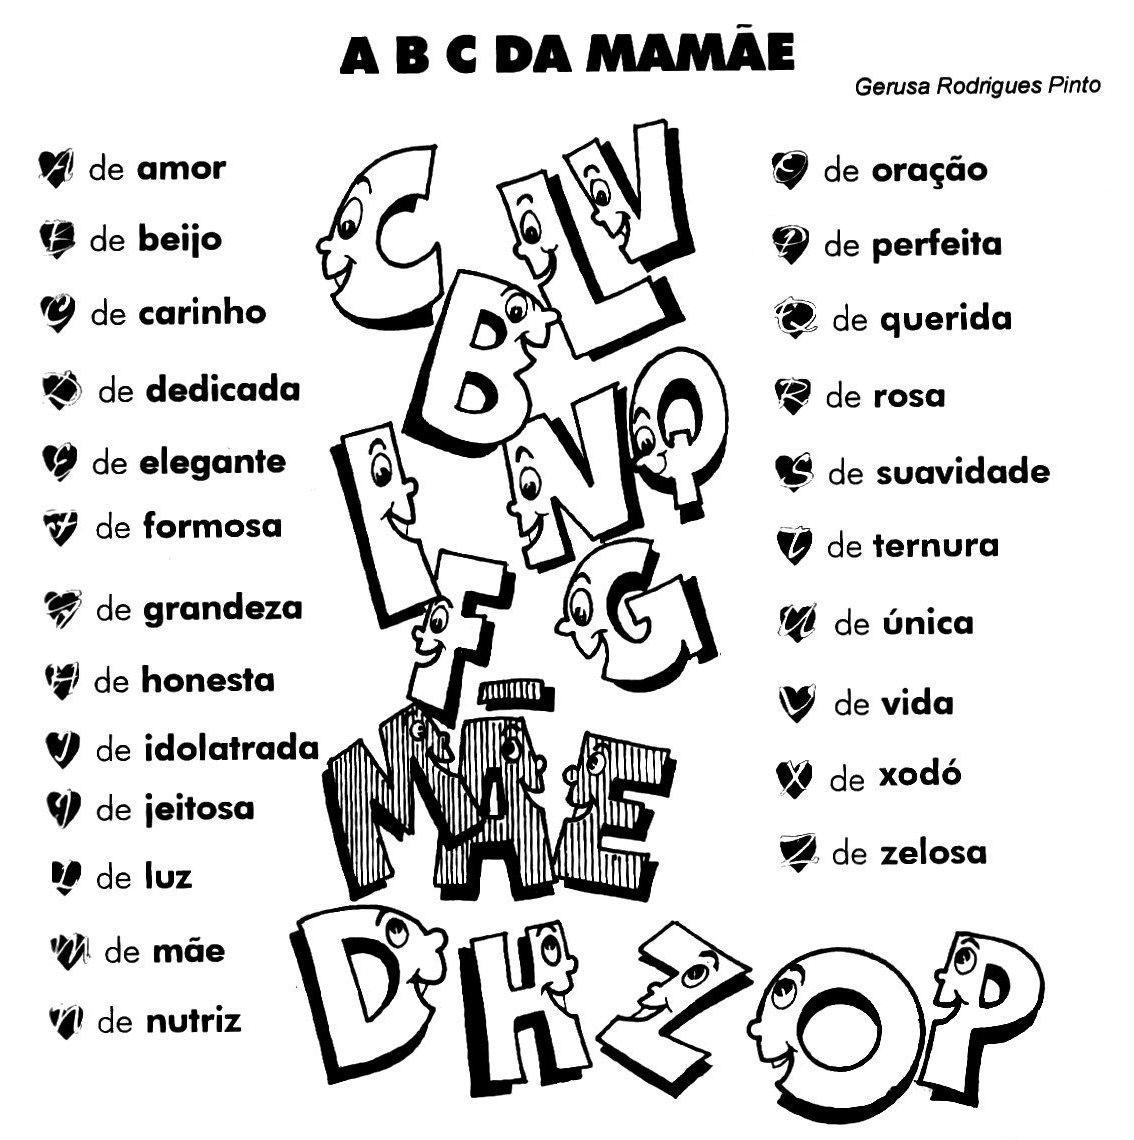 [ABC++da+mamãe.jpg]